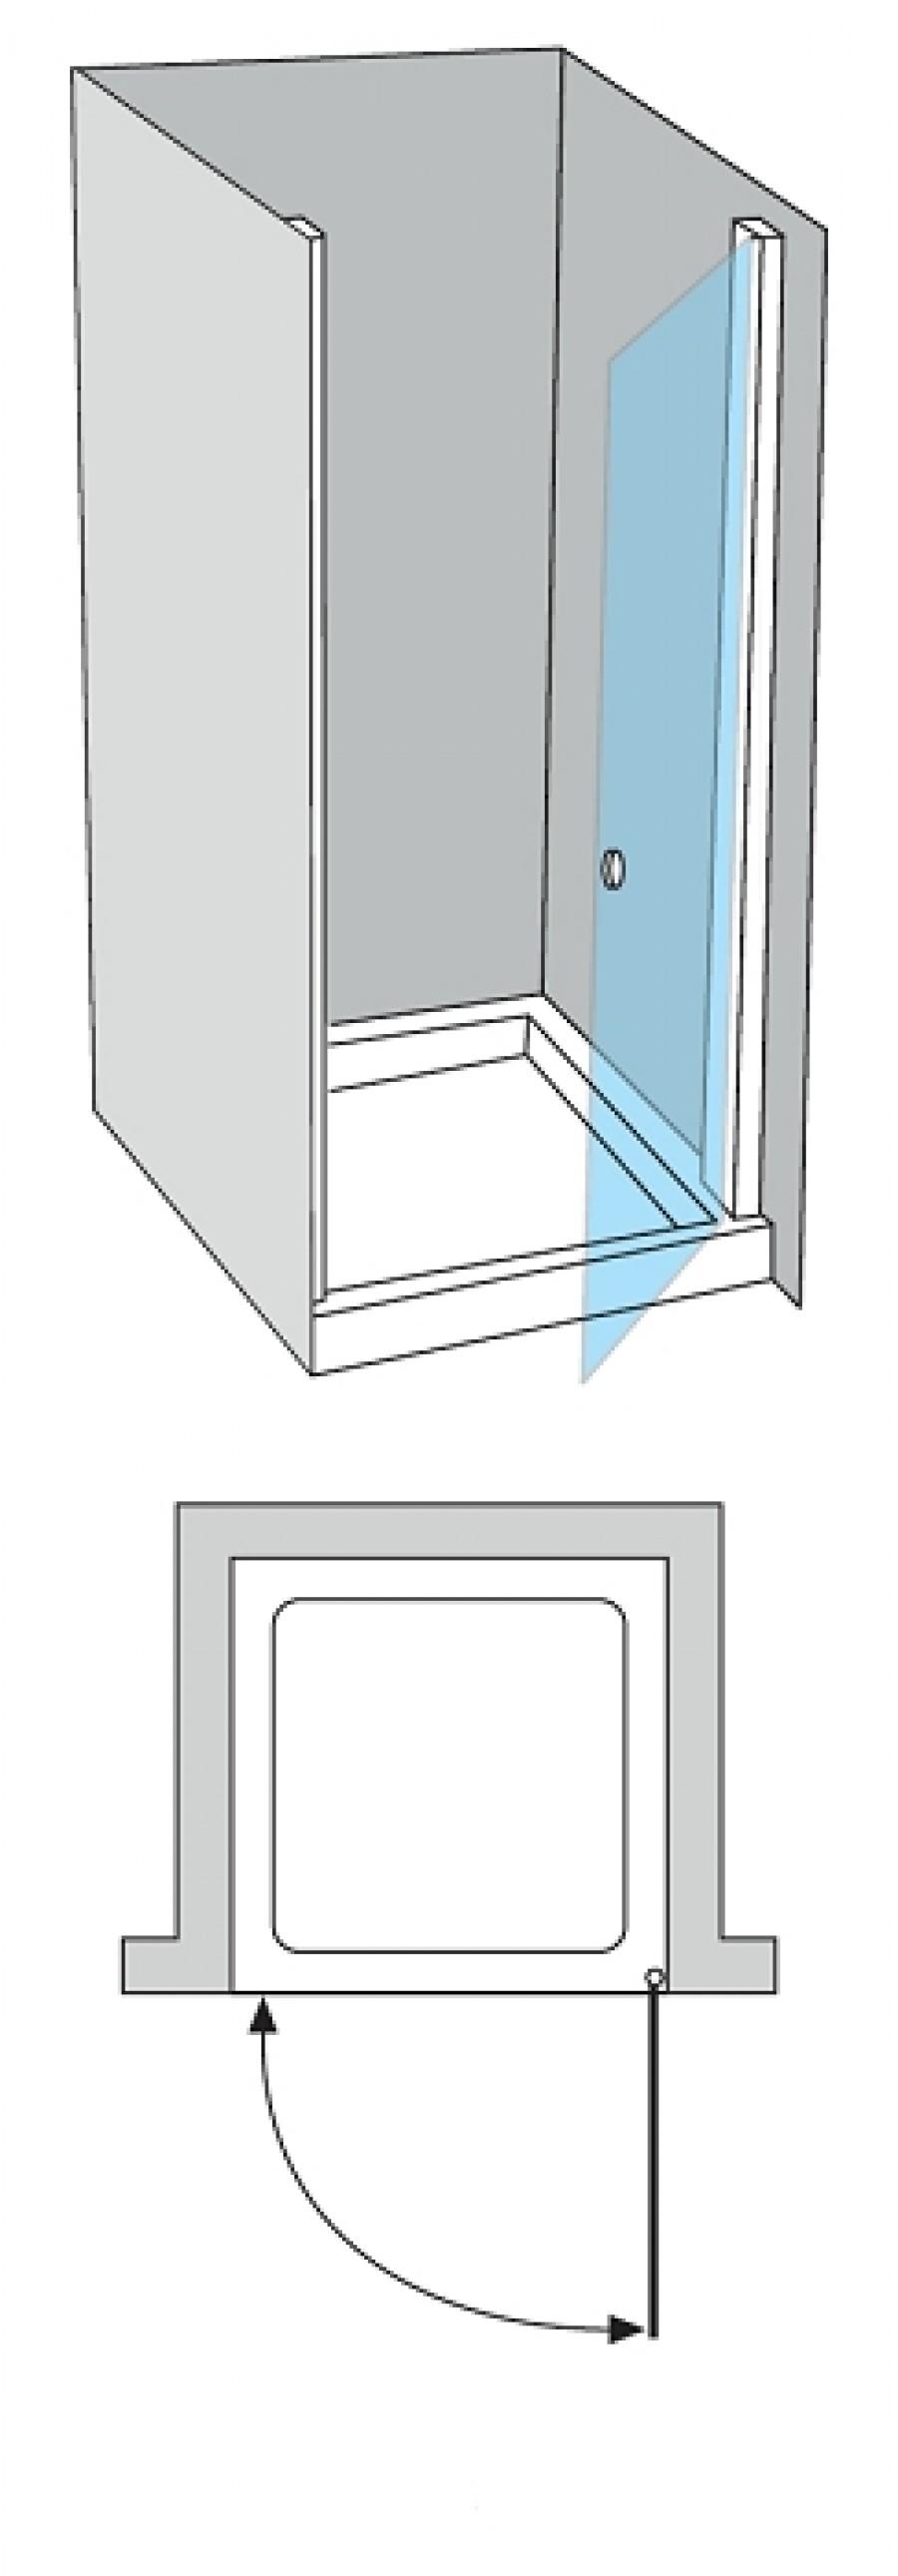 porte de douche pivotante verre transparent bande sabl e. Black Bedroom Furniture Sets. Home Design Ideas